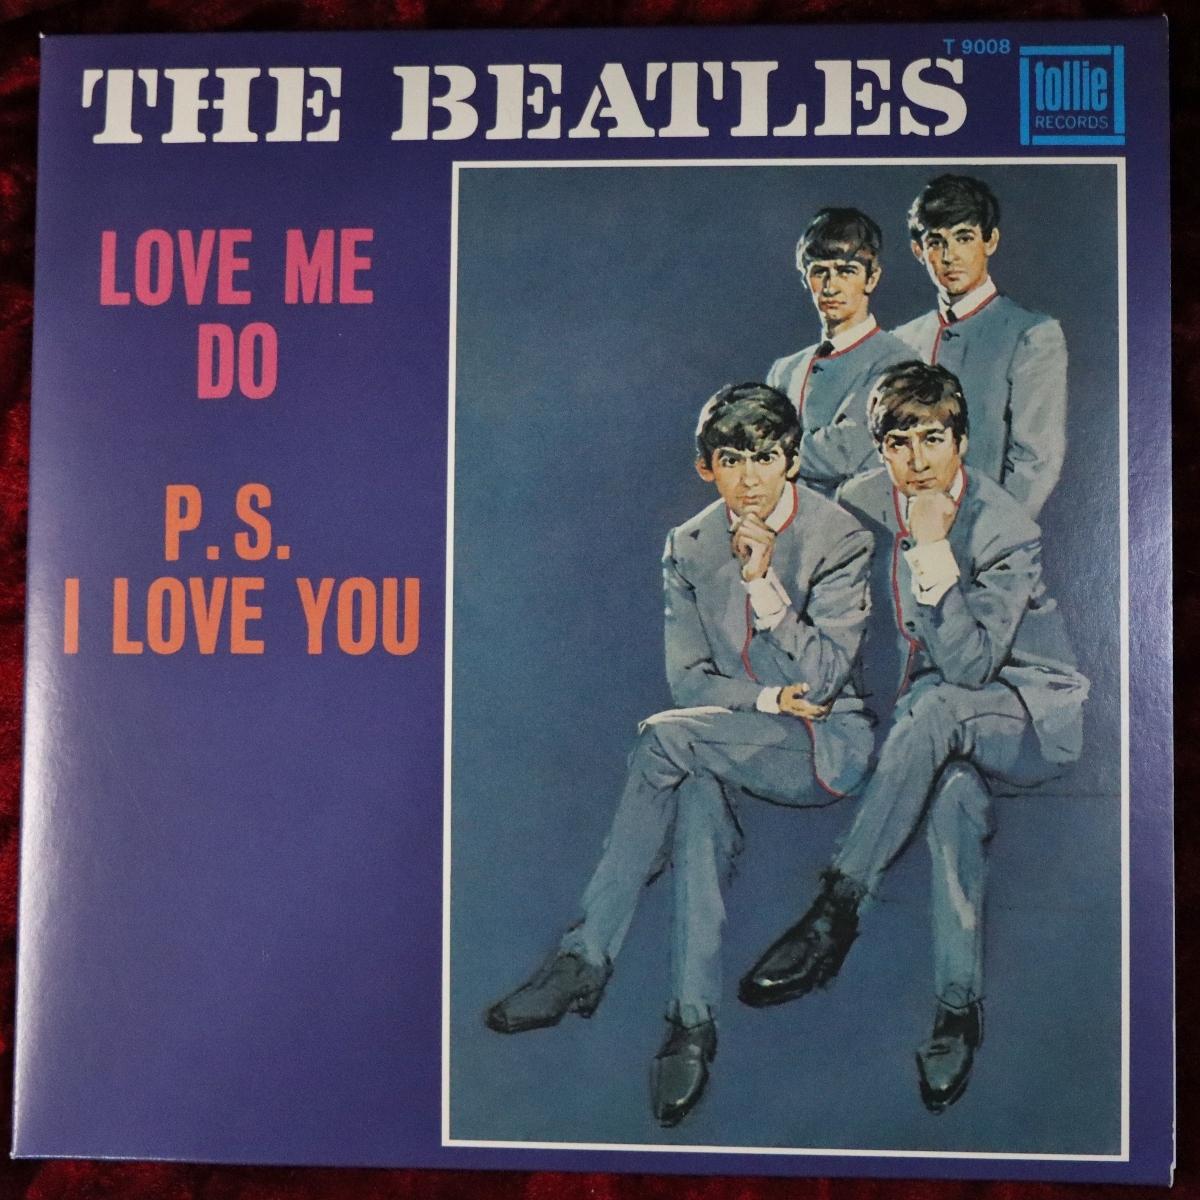 The Beatles/ビートルズ LOVE ME DO / P.S. I LOVE YOU 2019シングルボックス バラ EU盤 (US盤スリーブアート) 21C25009